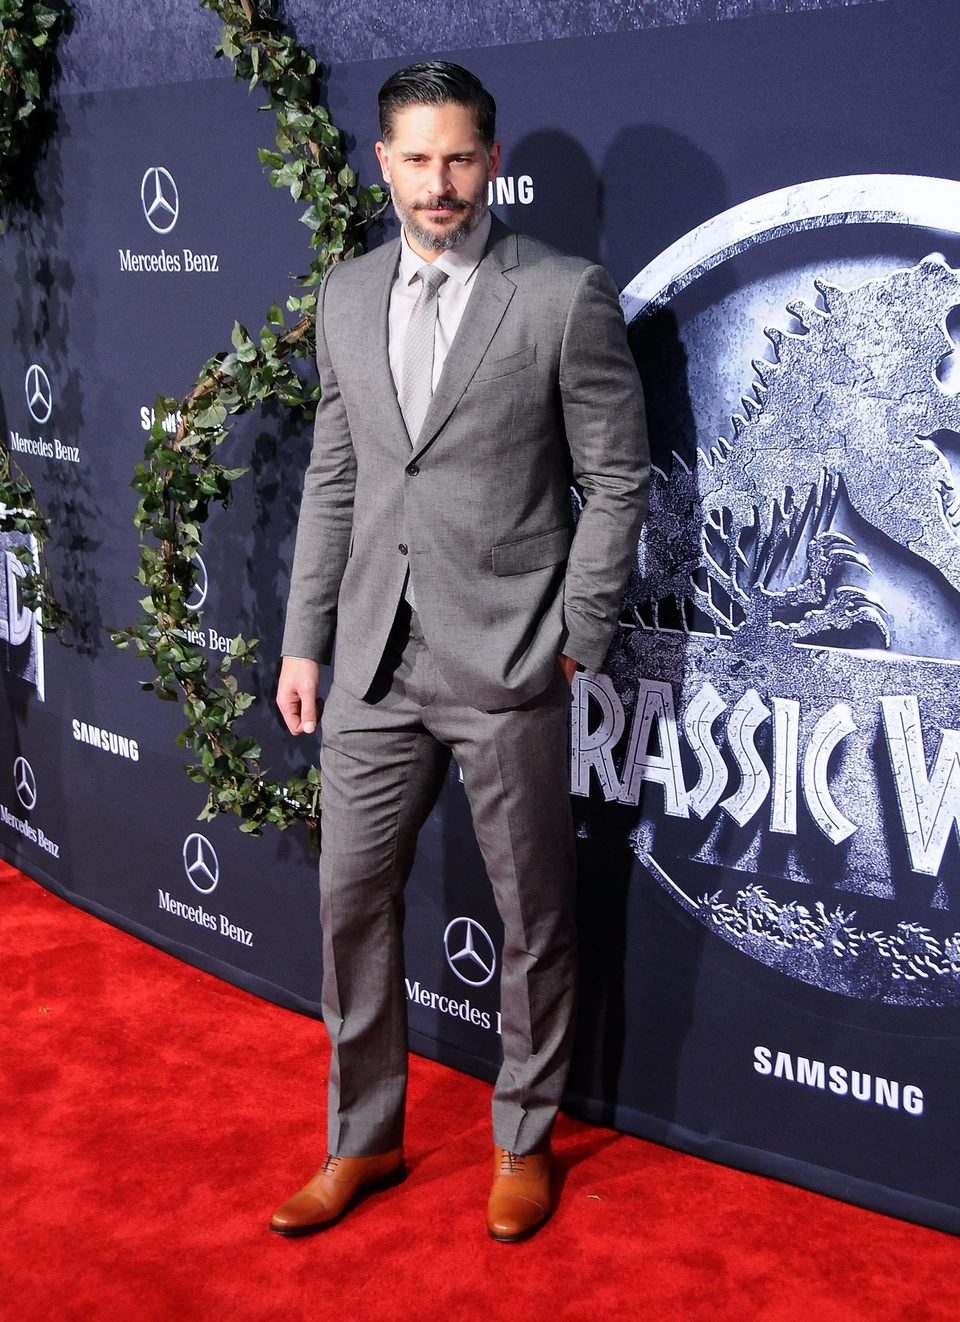 Joe Manganiello en el photocall de la premiere de 'Jurassic World'